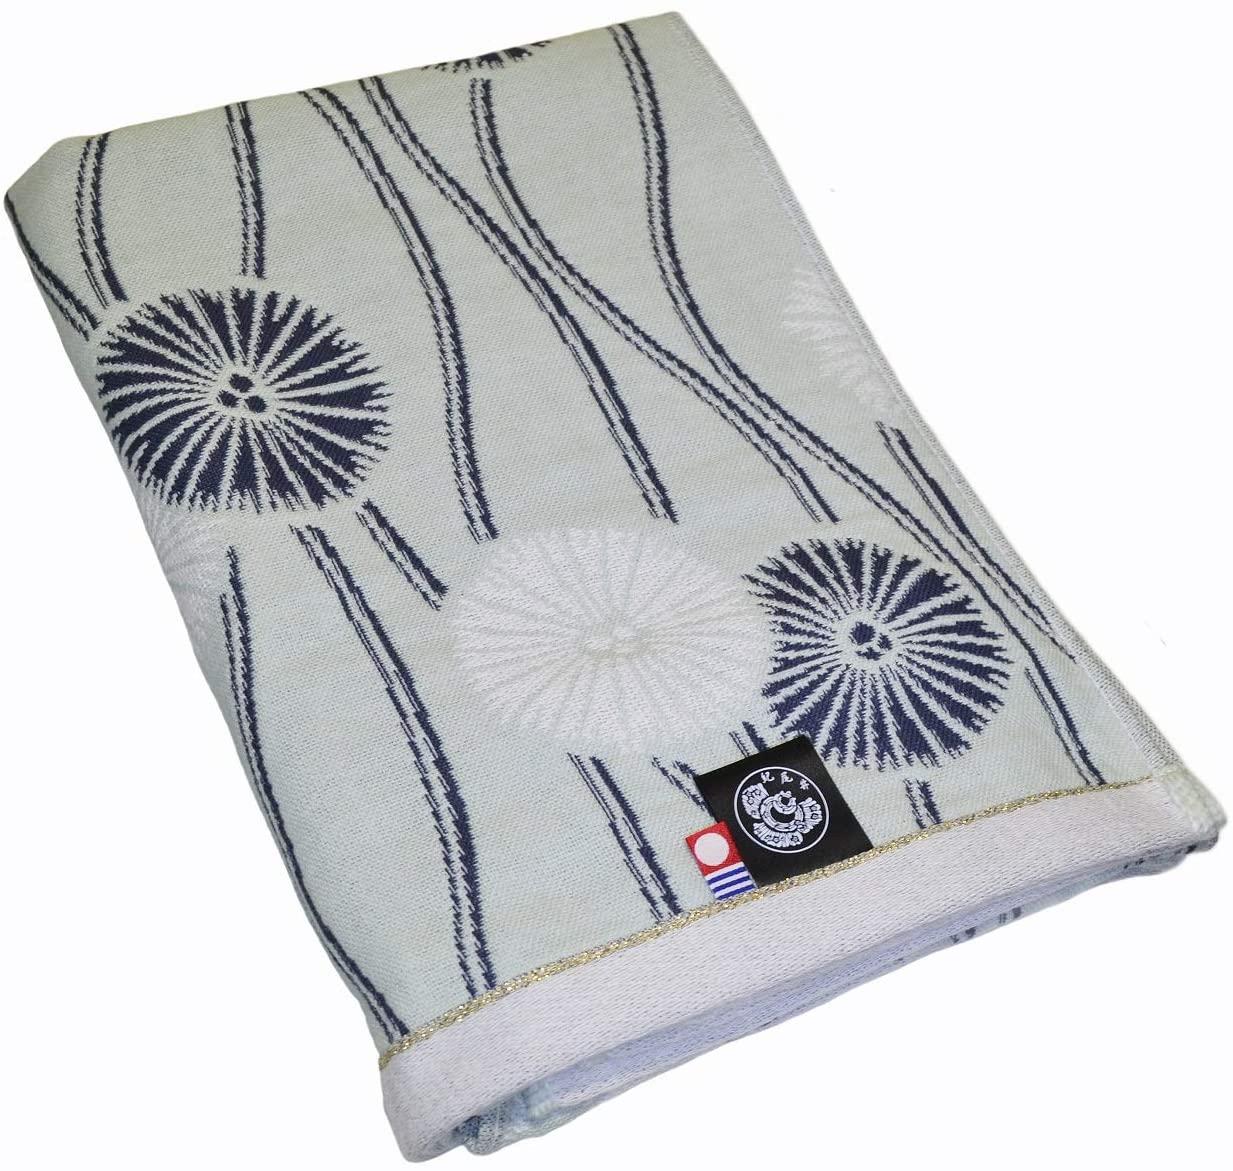 Imabari Towel Kioi Ise-Katagami Collection Chrysanthemum Design Bath Towel 1 pcs